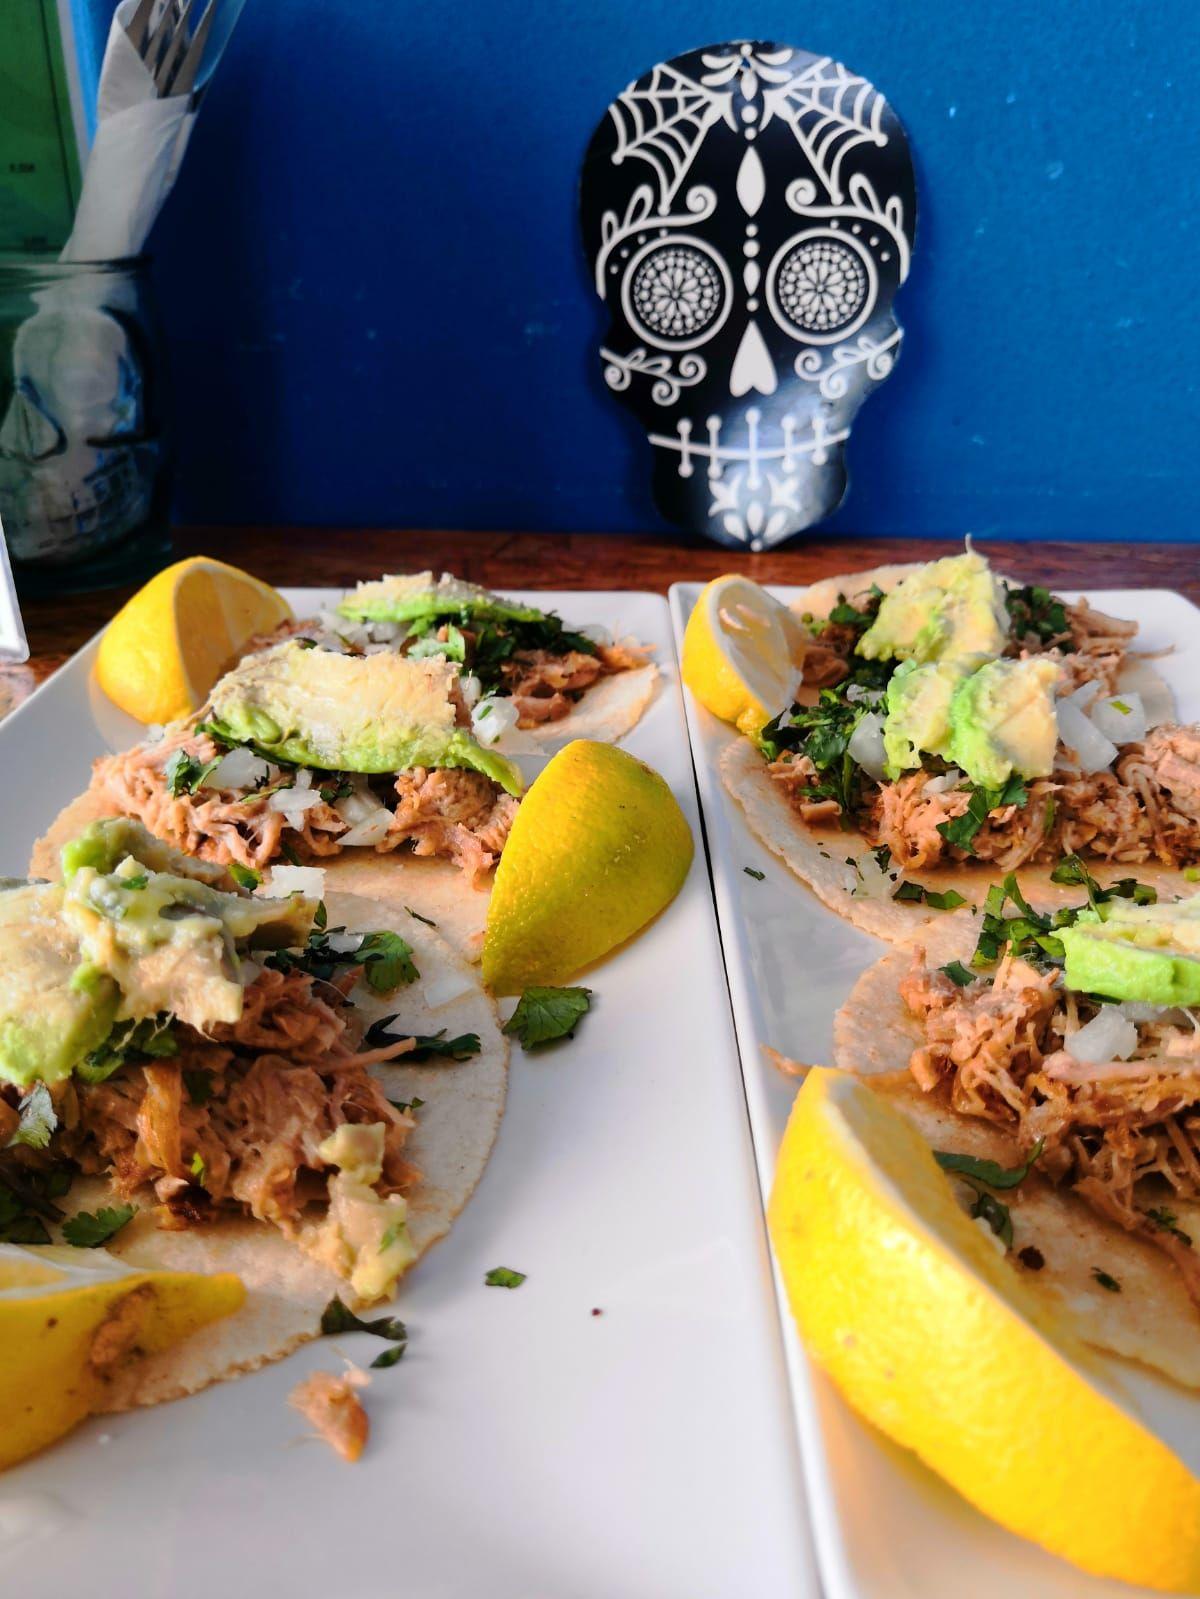 Foto 24 de Restaurante mexicano en    Cantina La Catrina